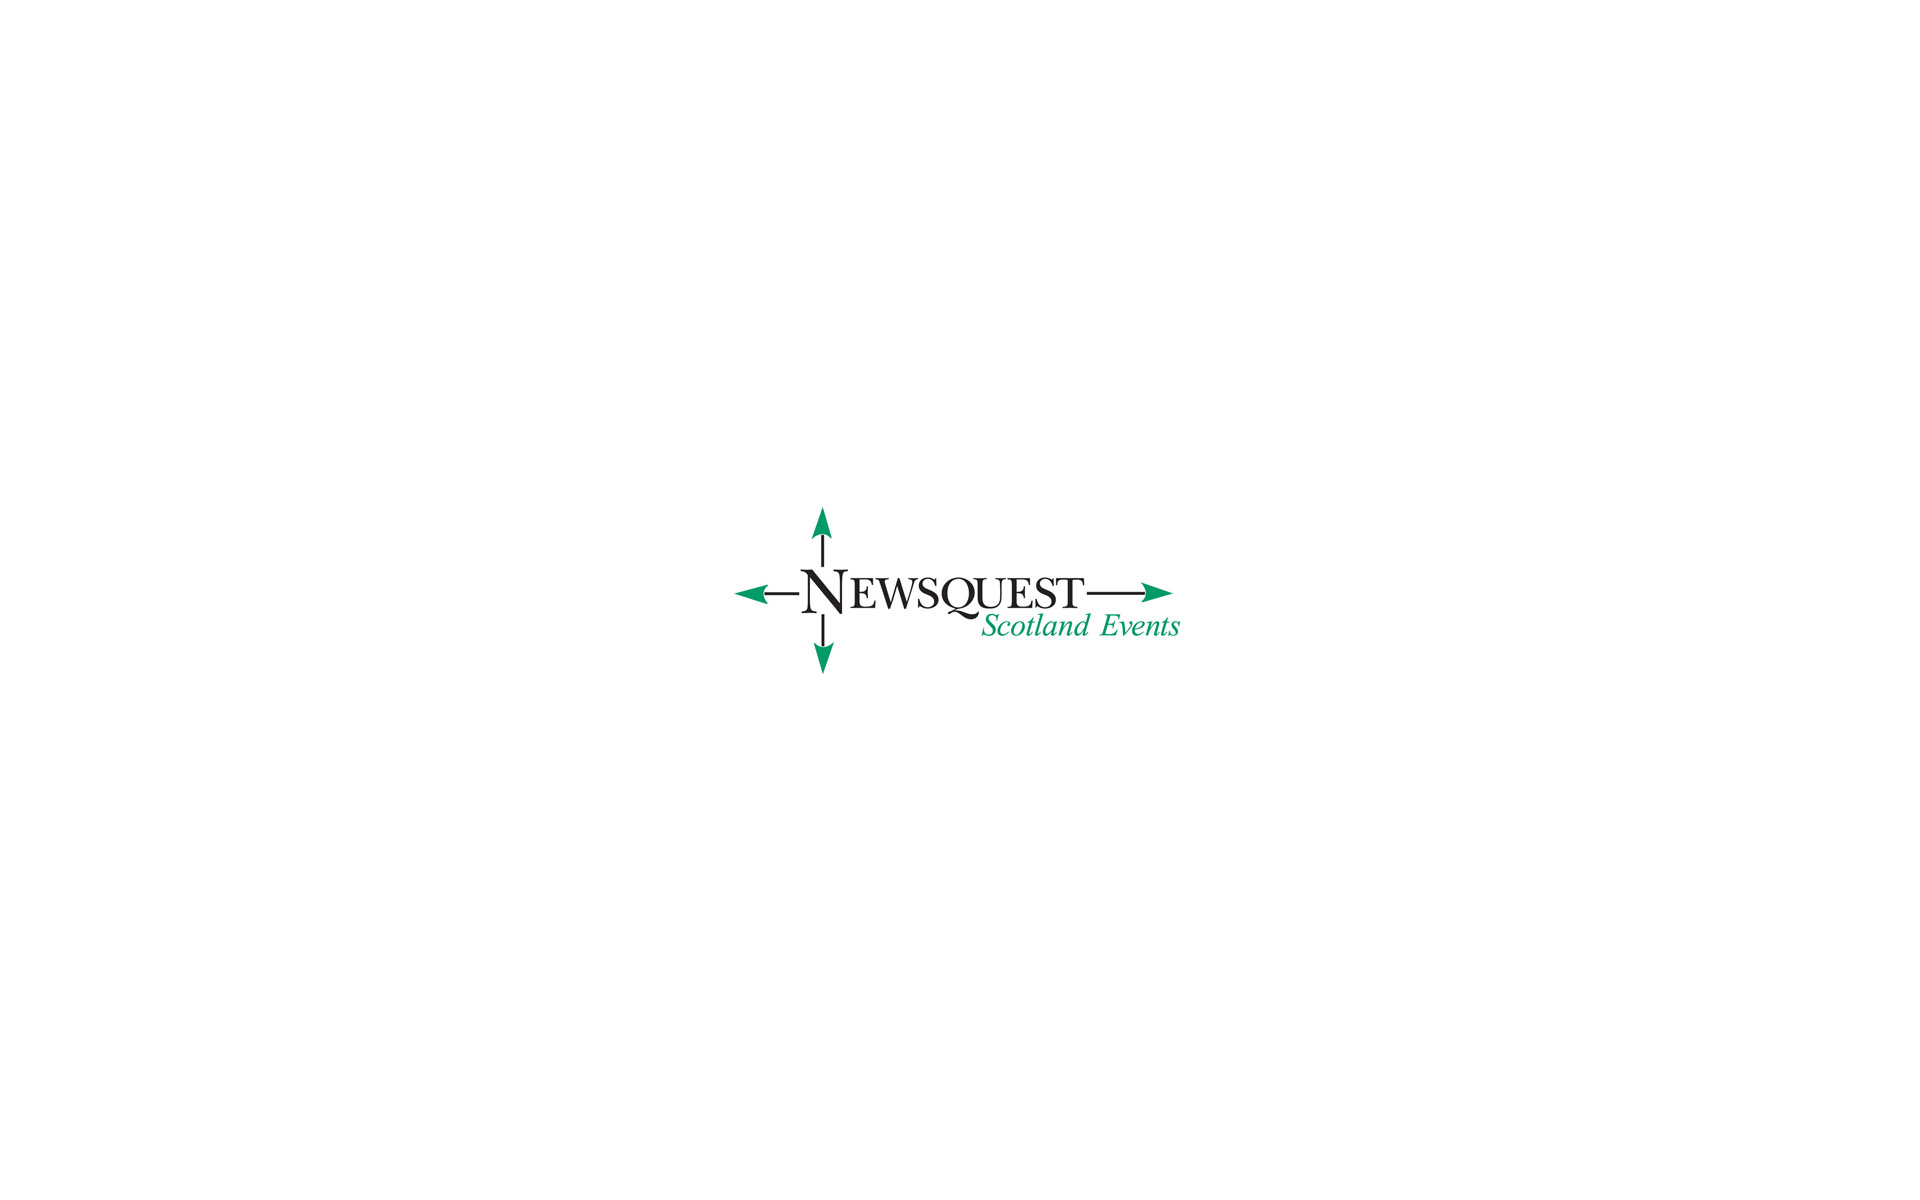 Newsquest Scotland Events